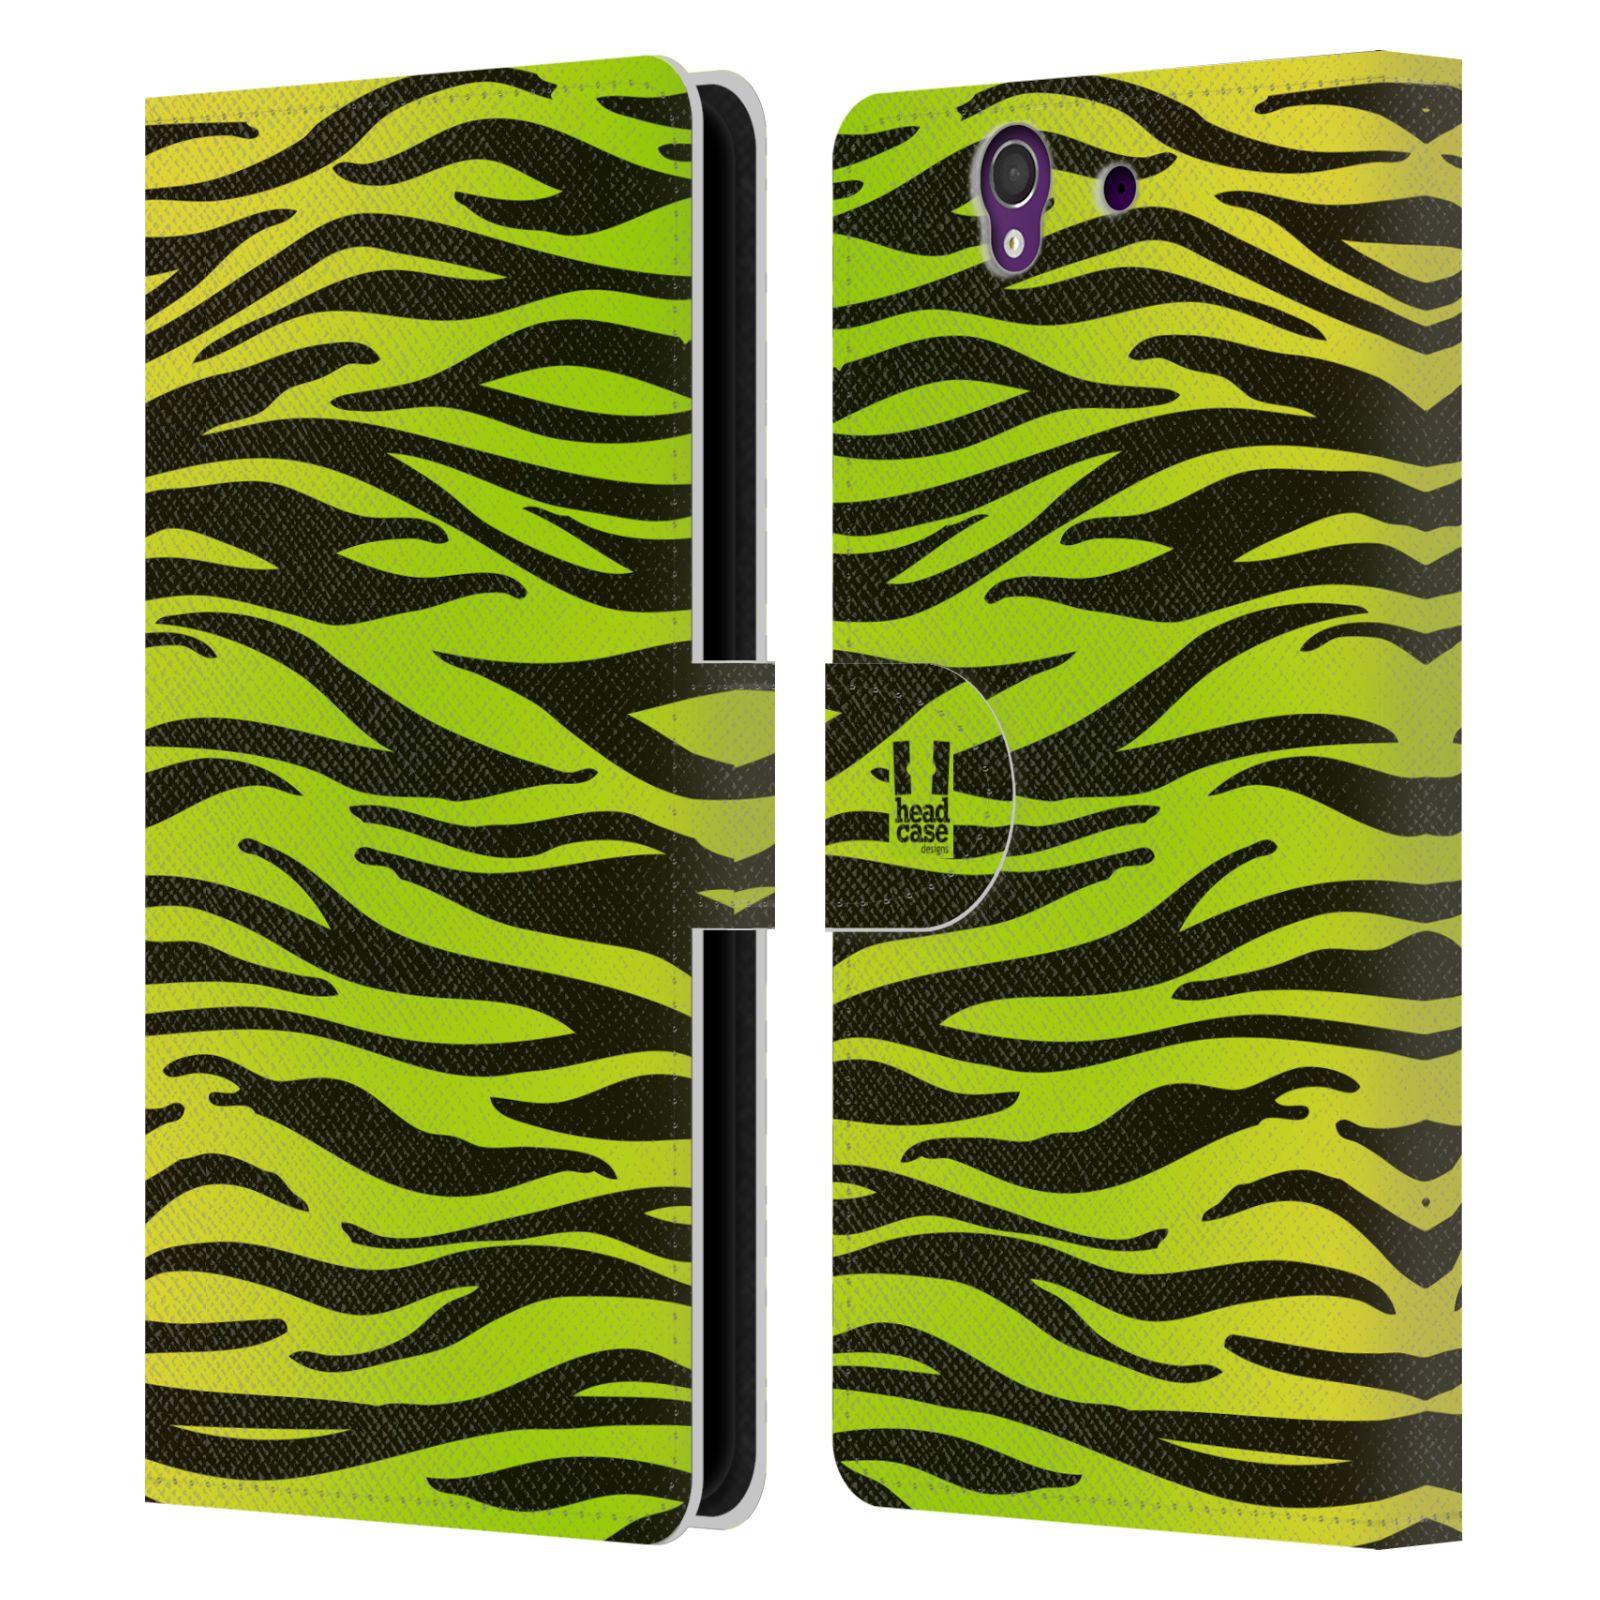 HEAD CASE Flipové pouzdro pro mobil SONY XPERIA Z (C6603) Zvířecí barevné vzory žlutozelená zebra